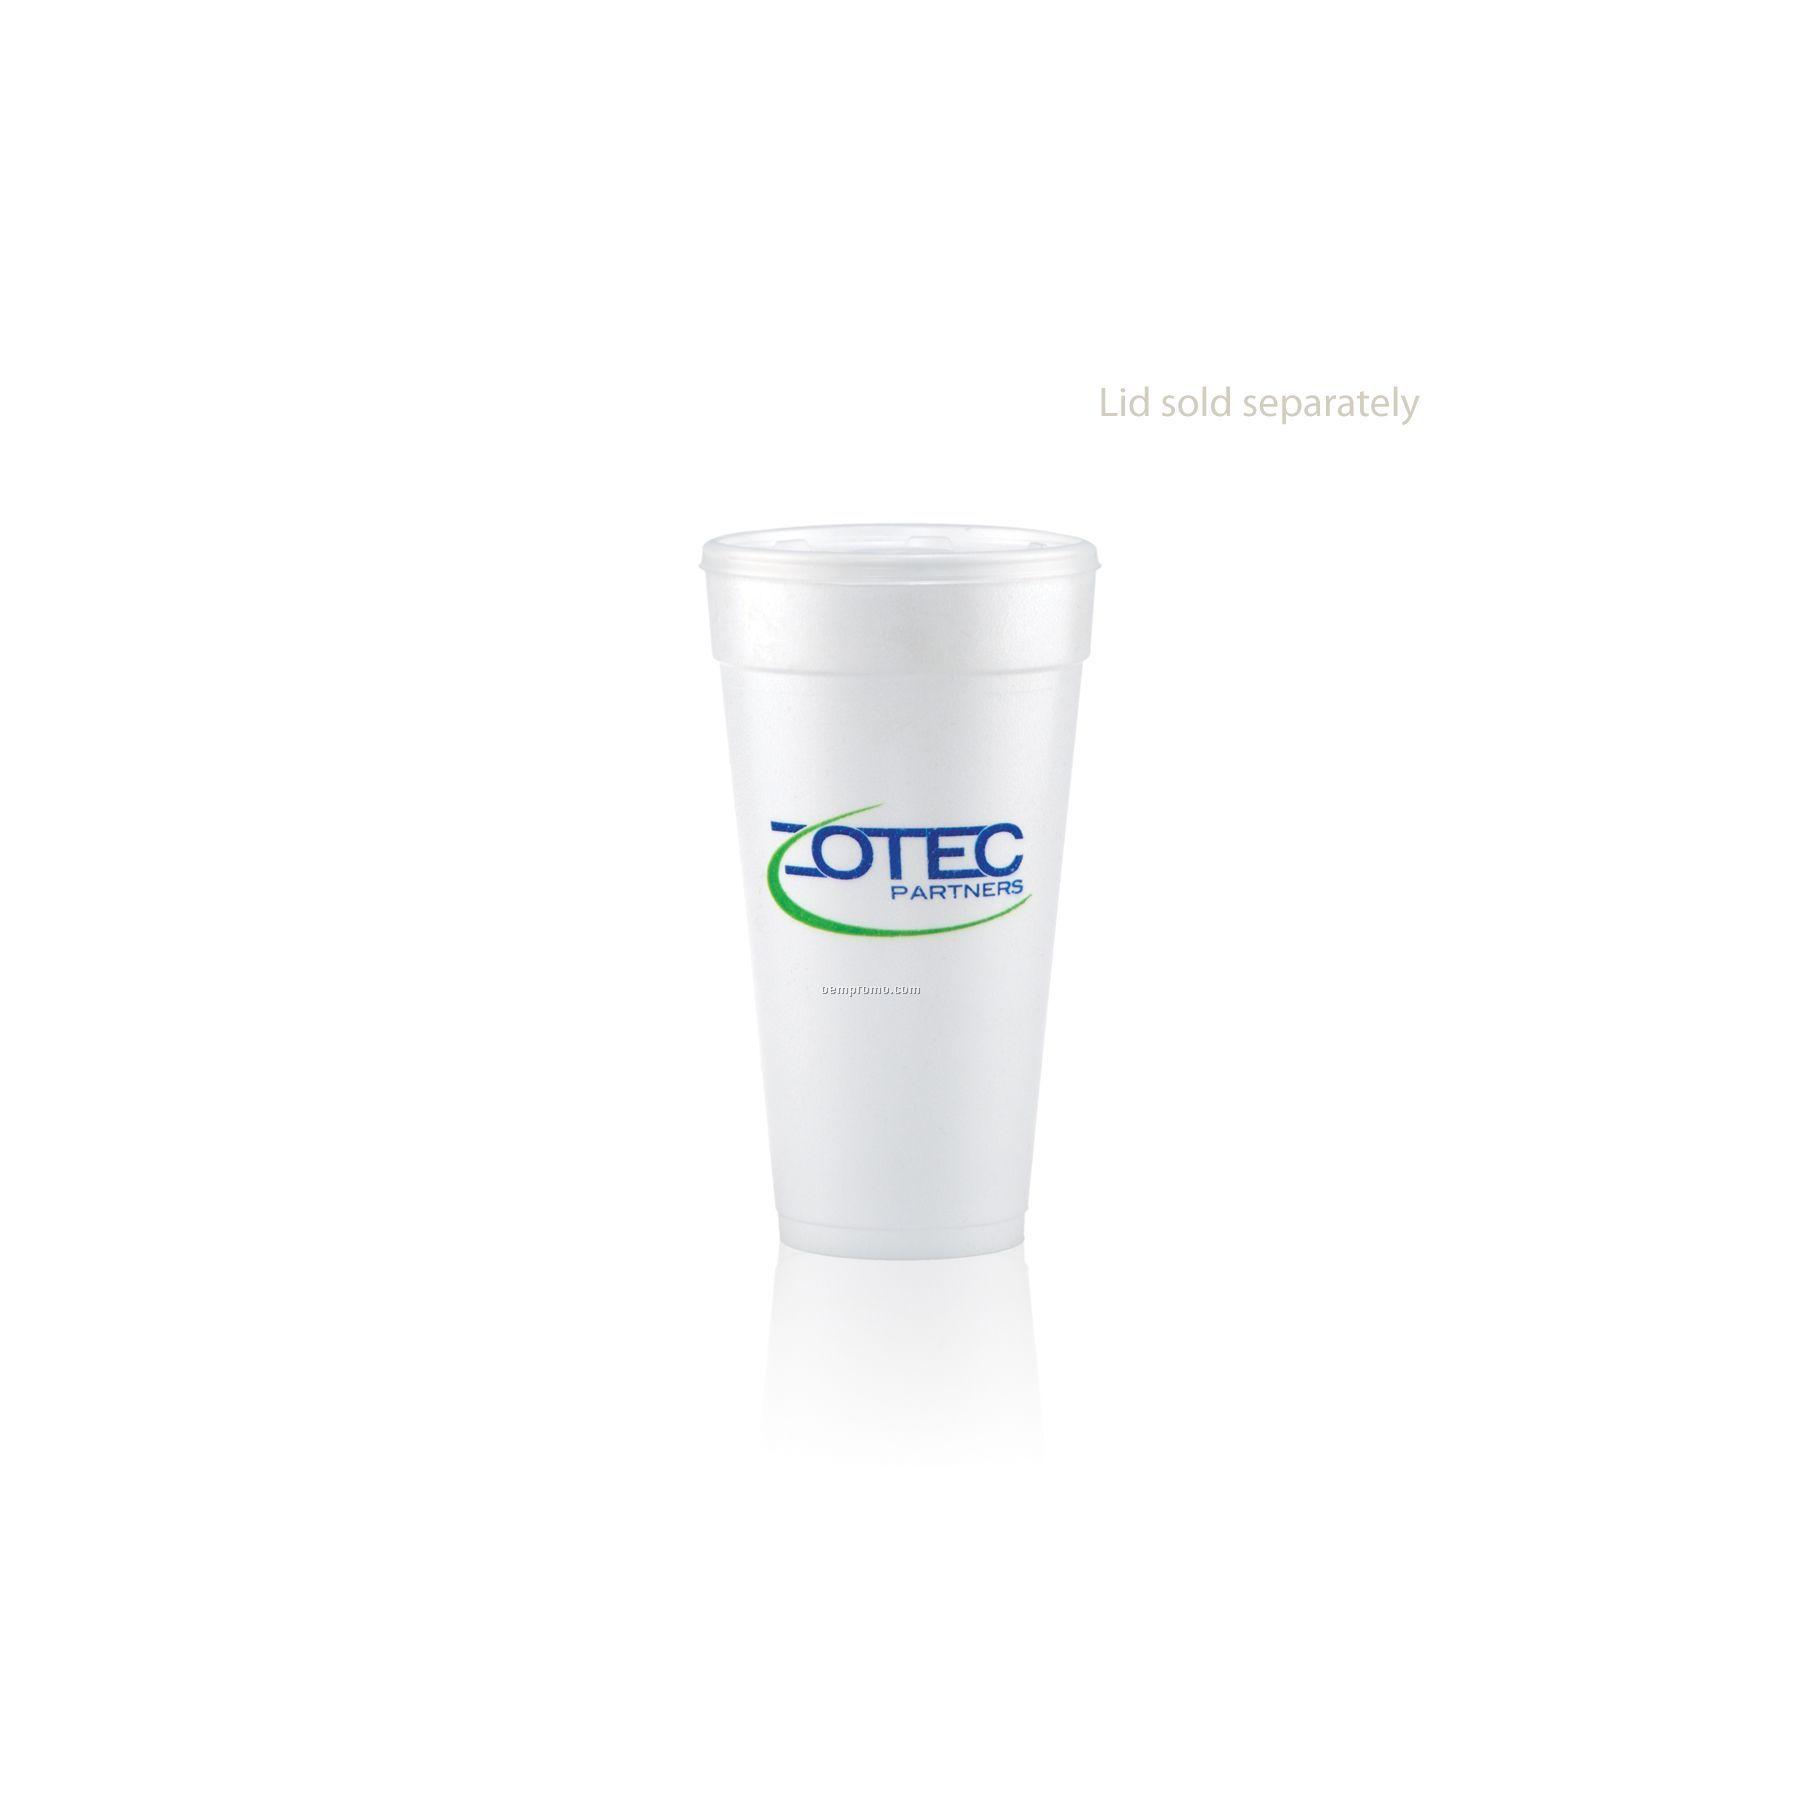 24 Oz. Foam Cup